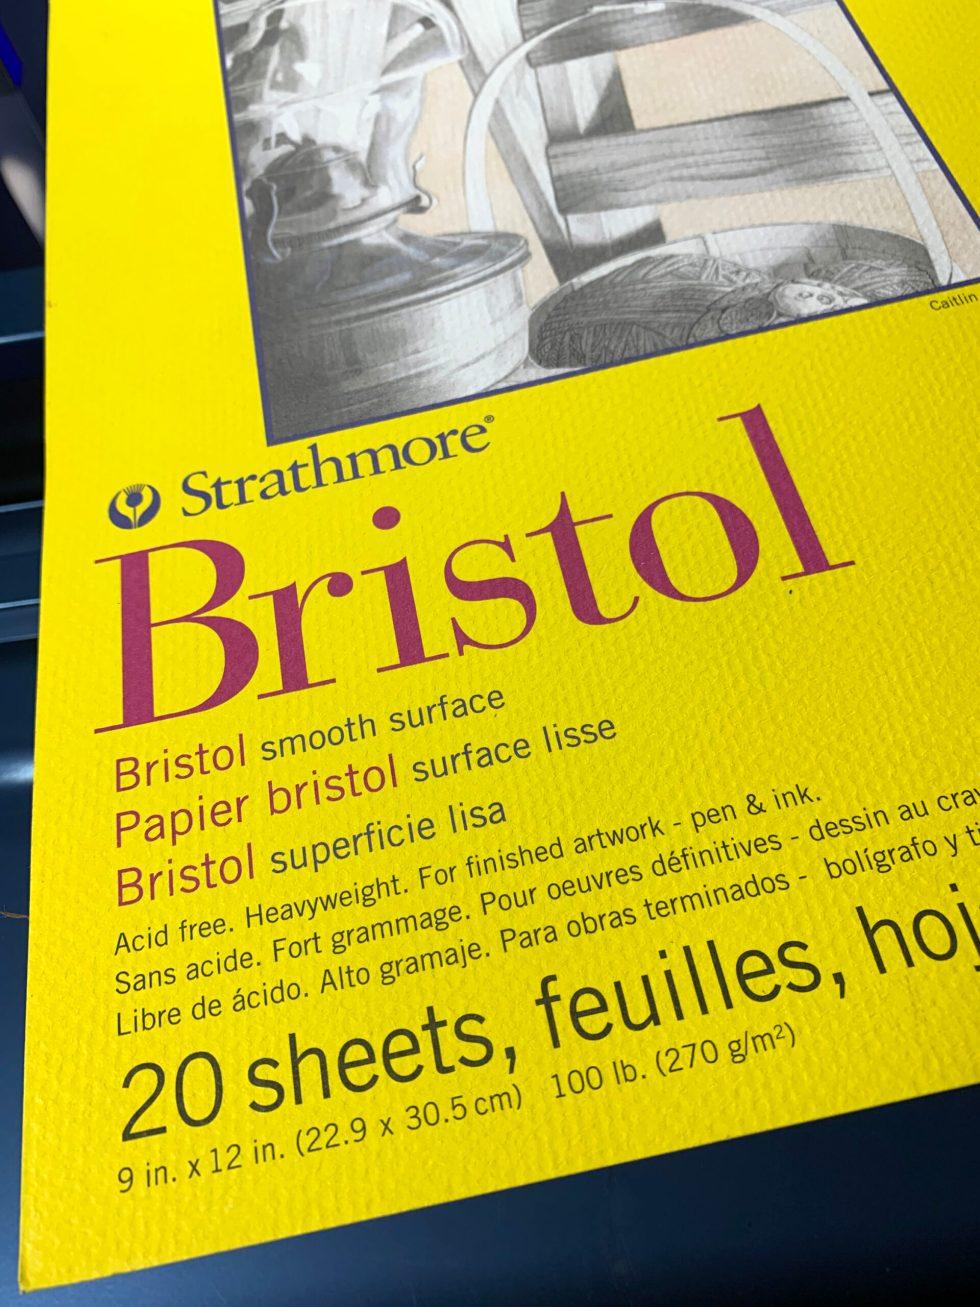 Strathmore Bristol Paper 300 series image 3